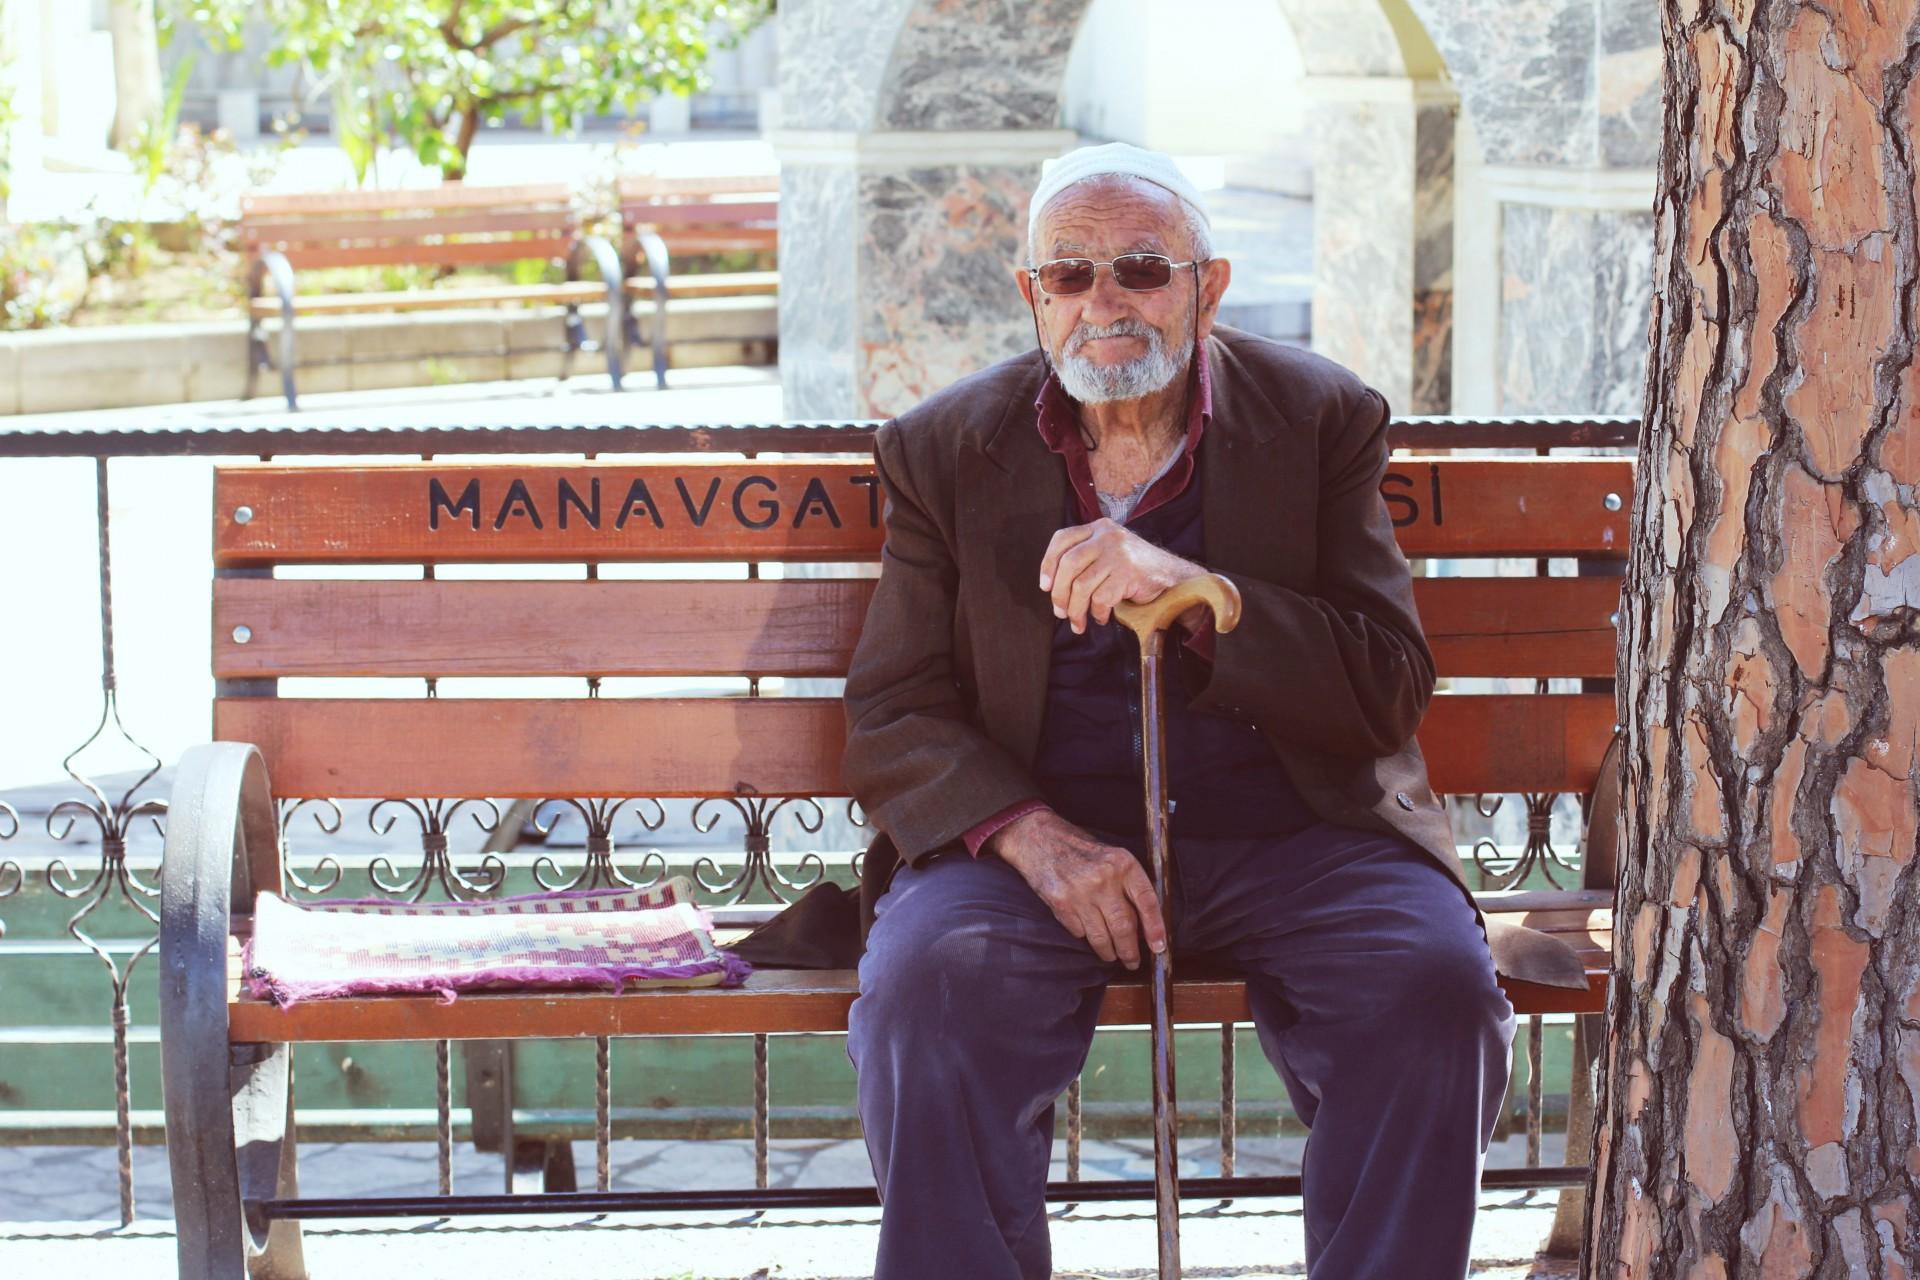 veraKoh. About Turkey